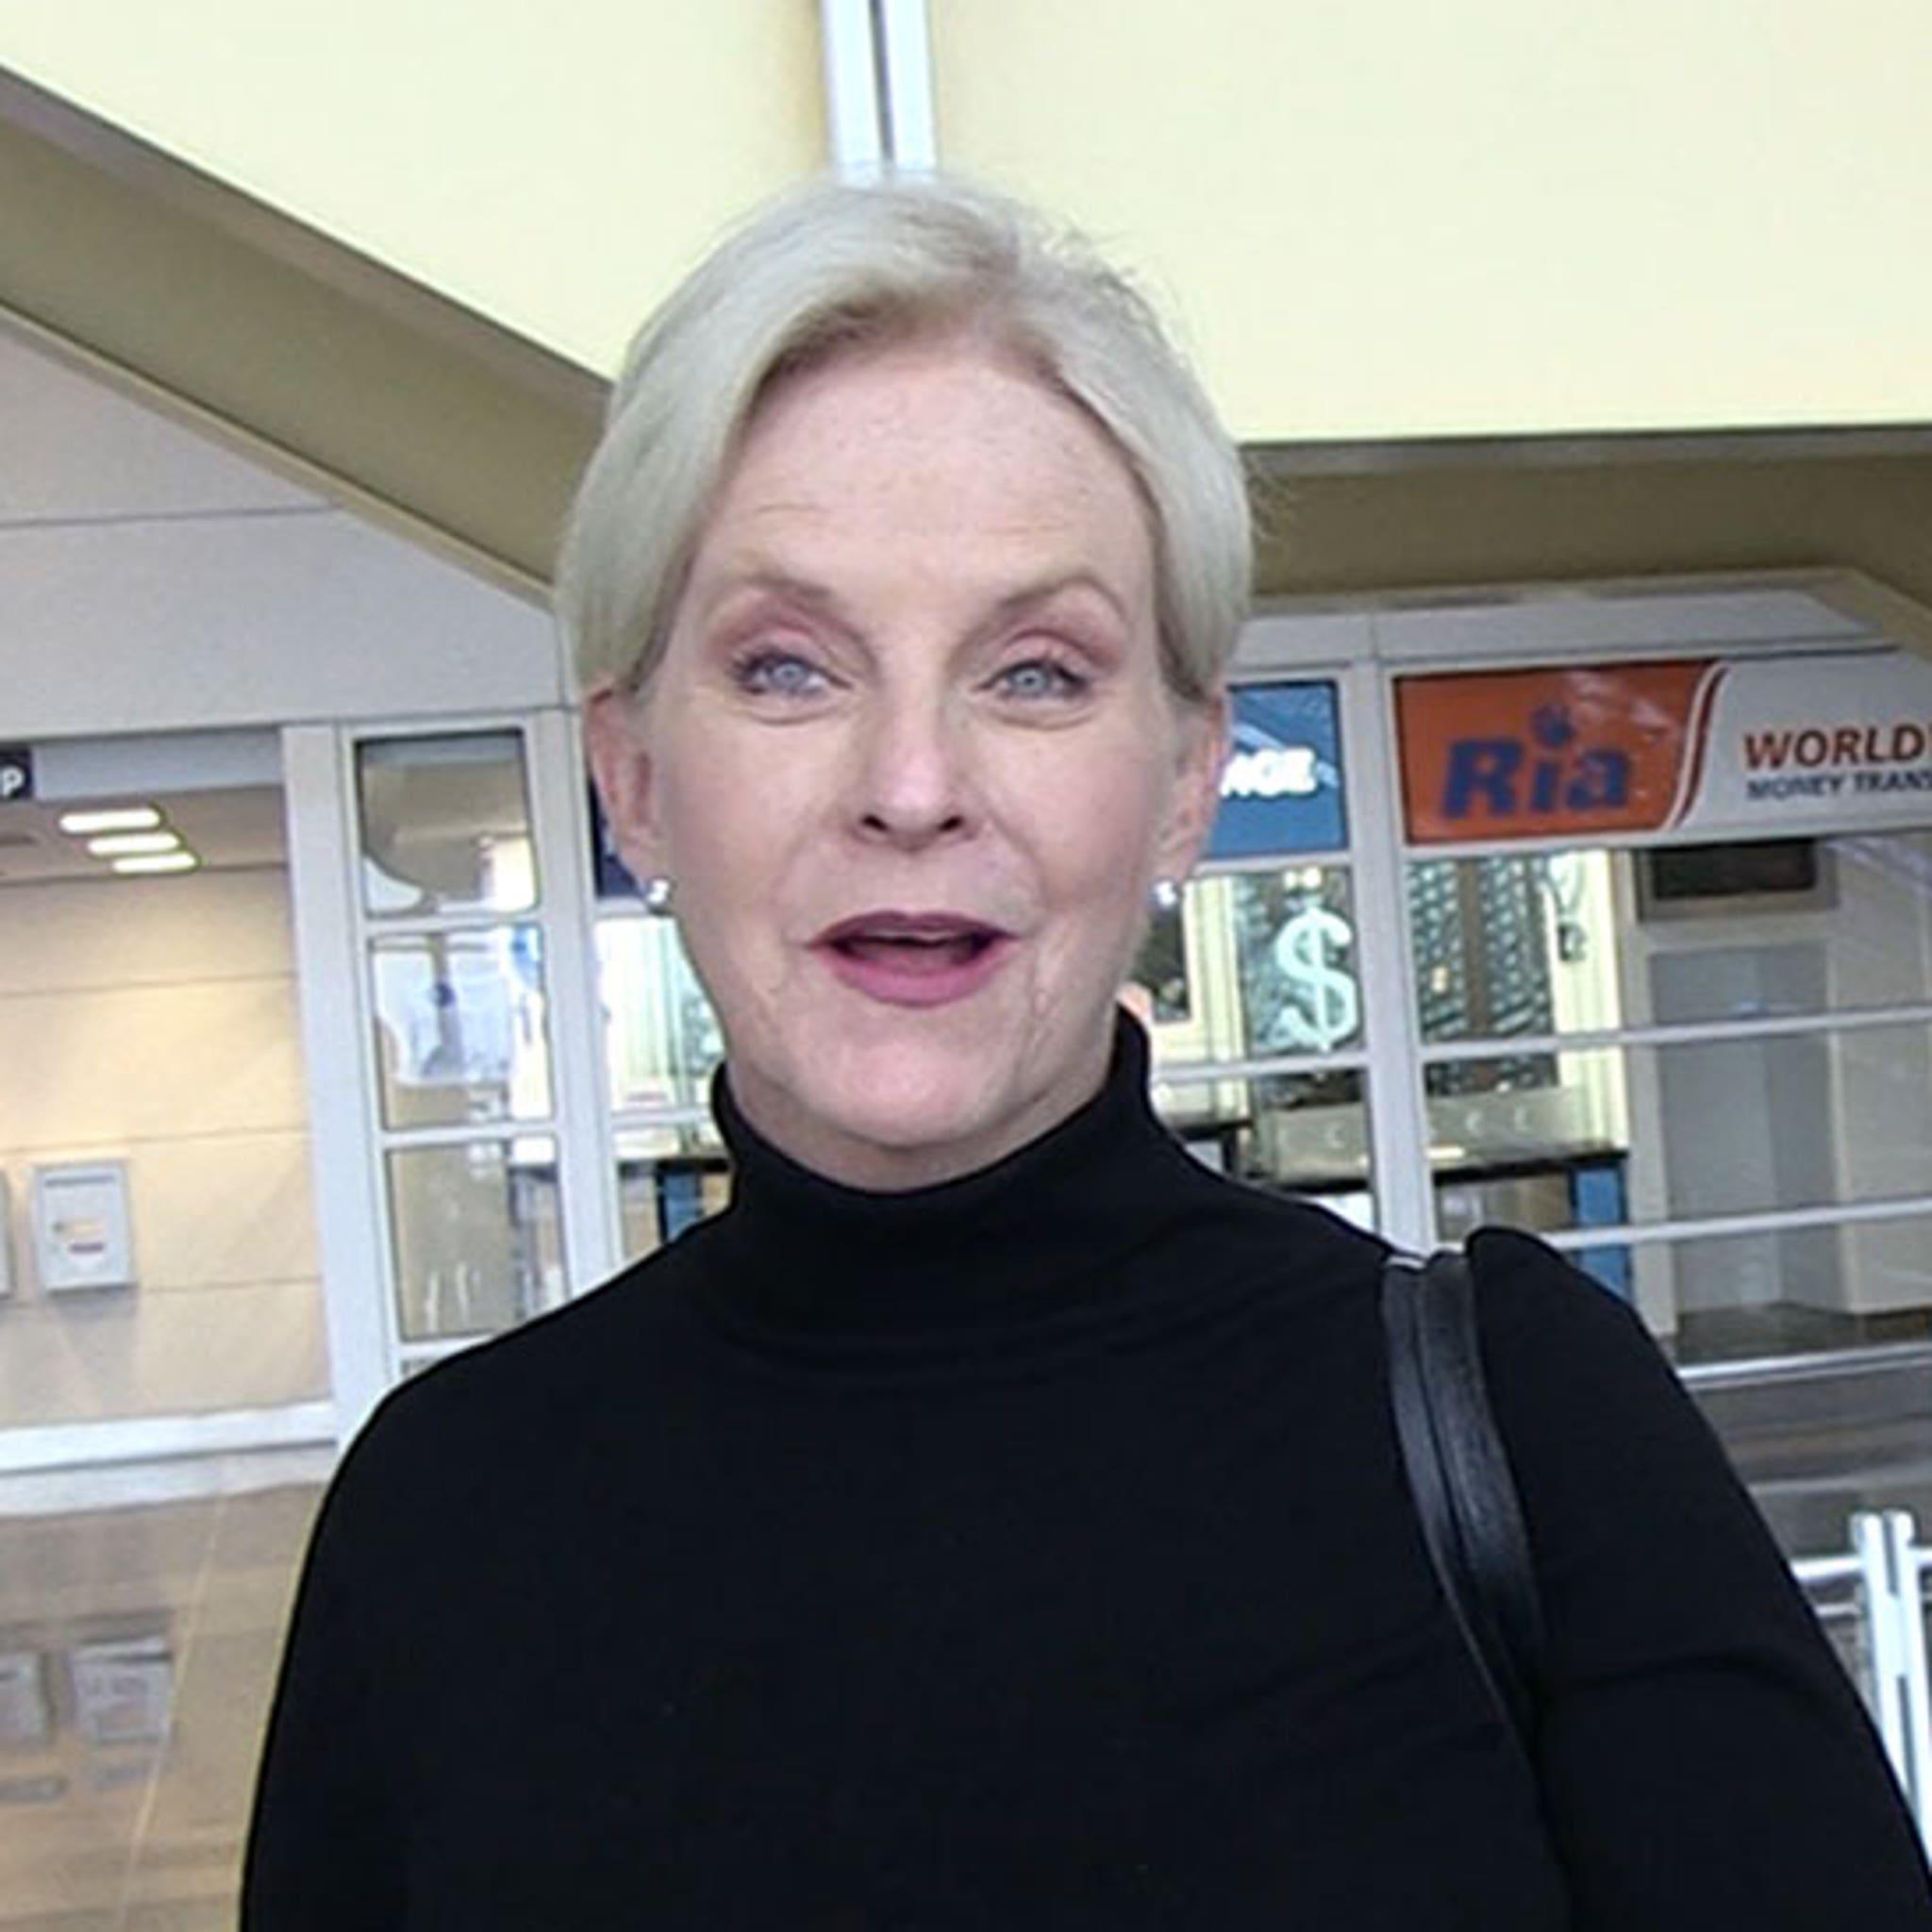 John McCain's Widow Says He Had Good Reason to Dislike Donald Trump